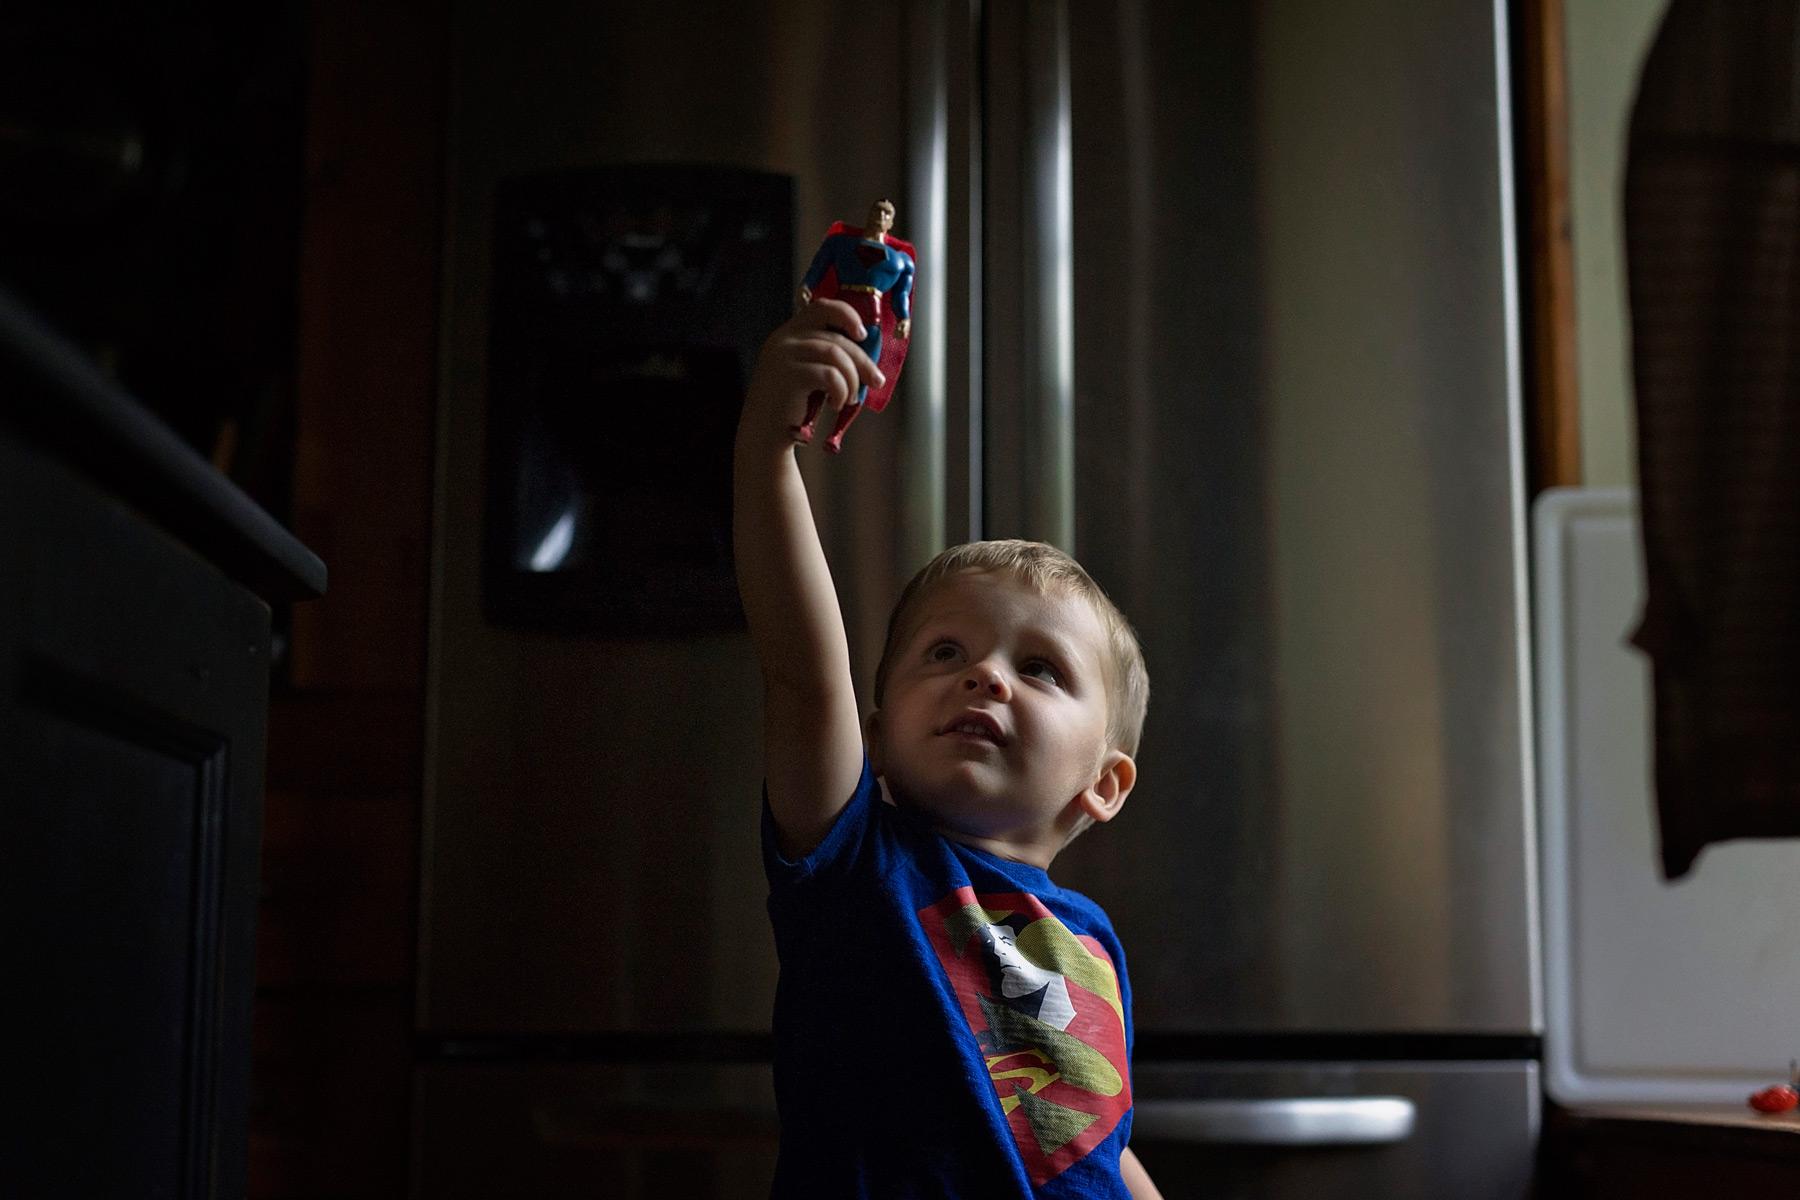 little boy flies superman figure overhead while wearing superman shirt